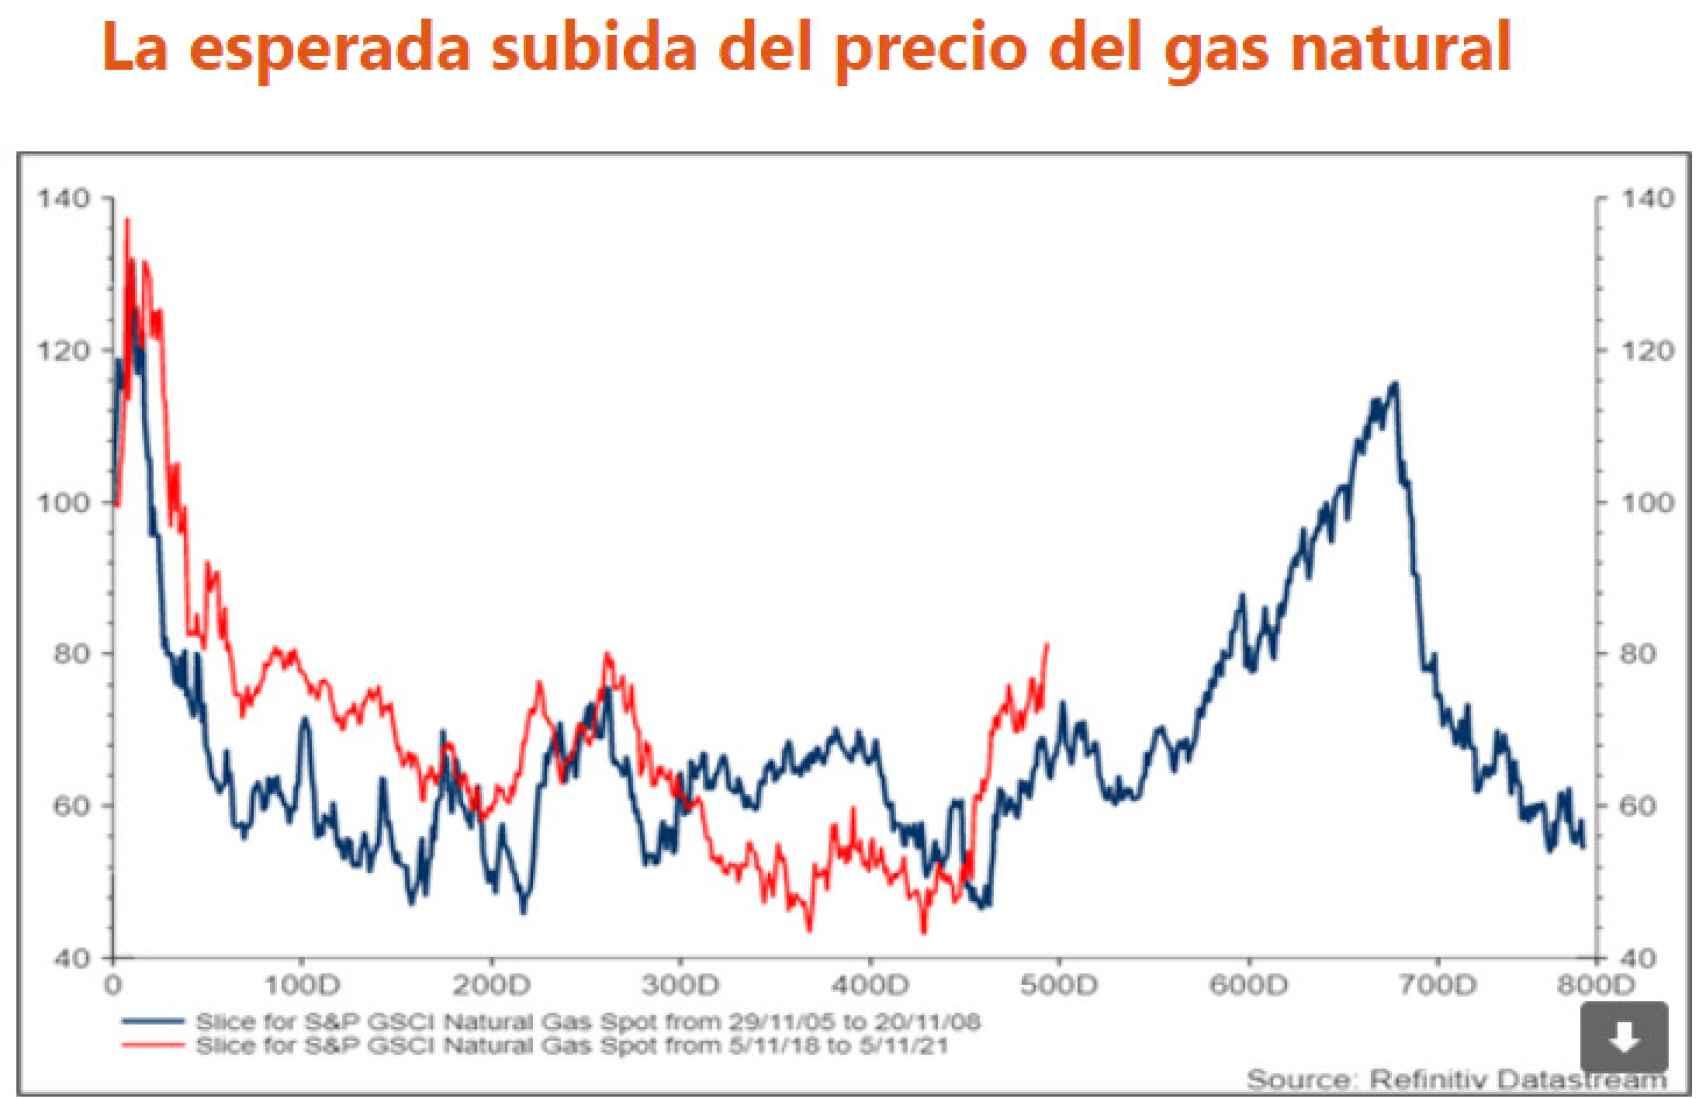 Fuente: Newsletter de Juan Ignacio Crespo.